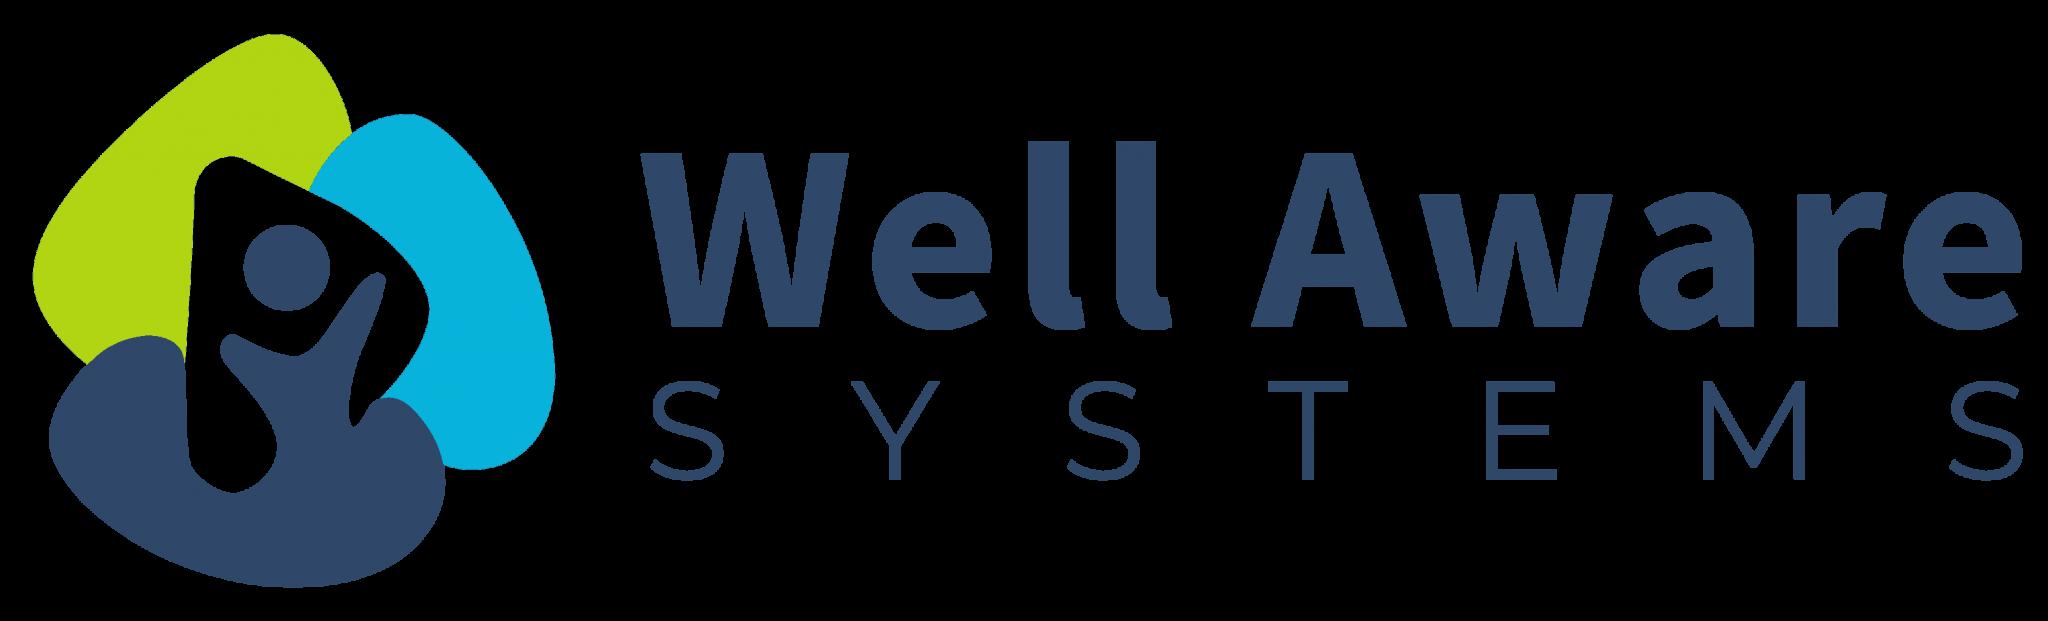 wellawaresystems logo